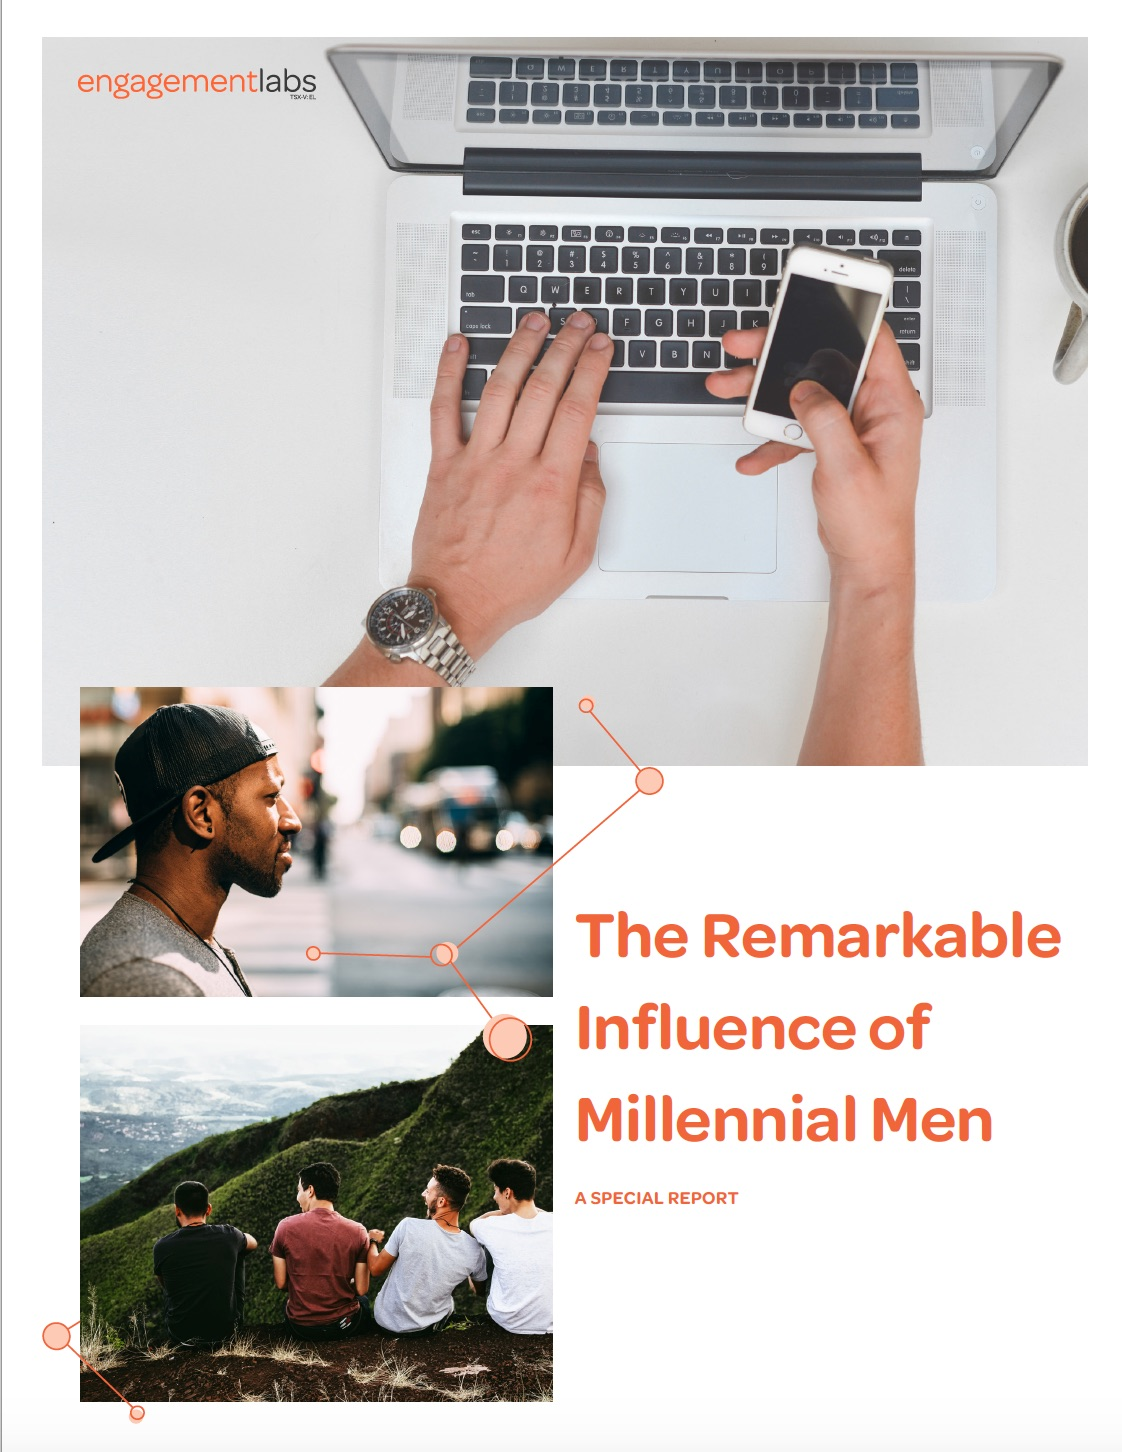 The Remarkable Influence of Millennial Men